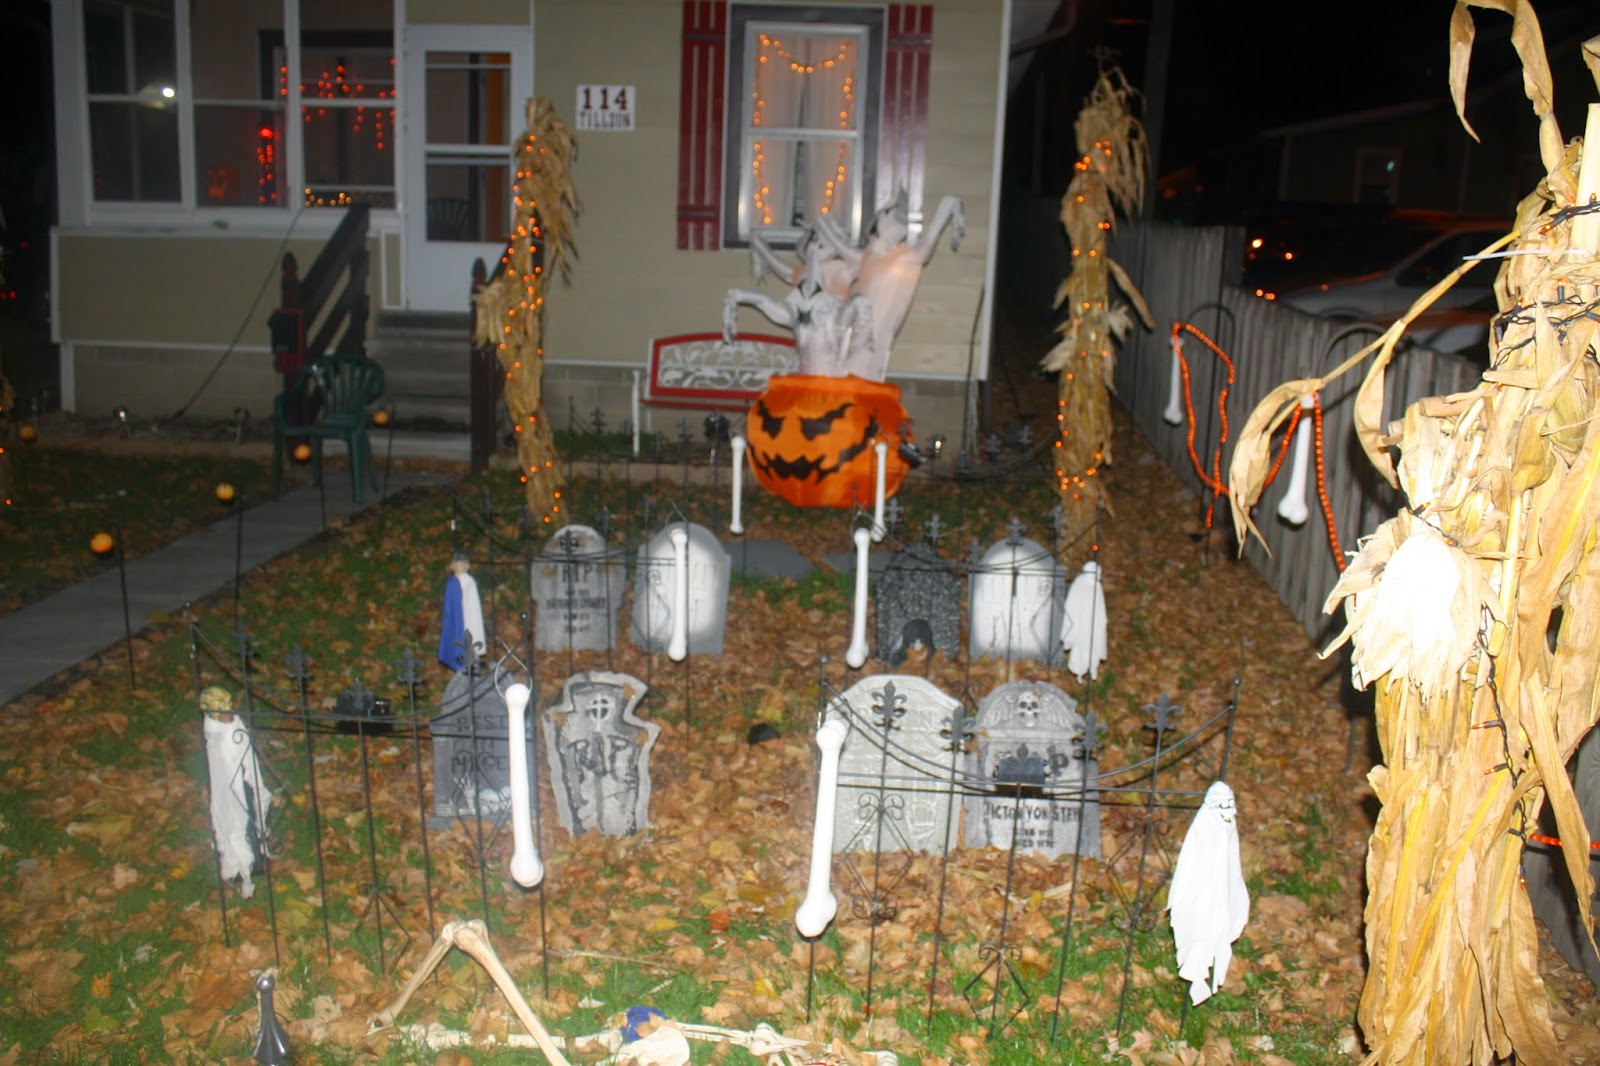 Dominik S Highschool Year In America Halloween